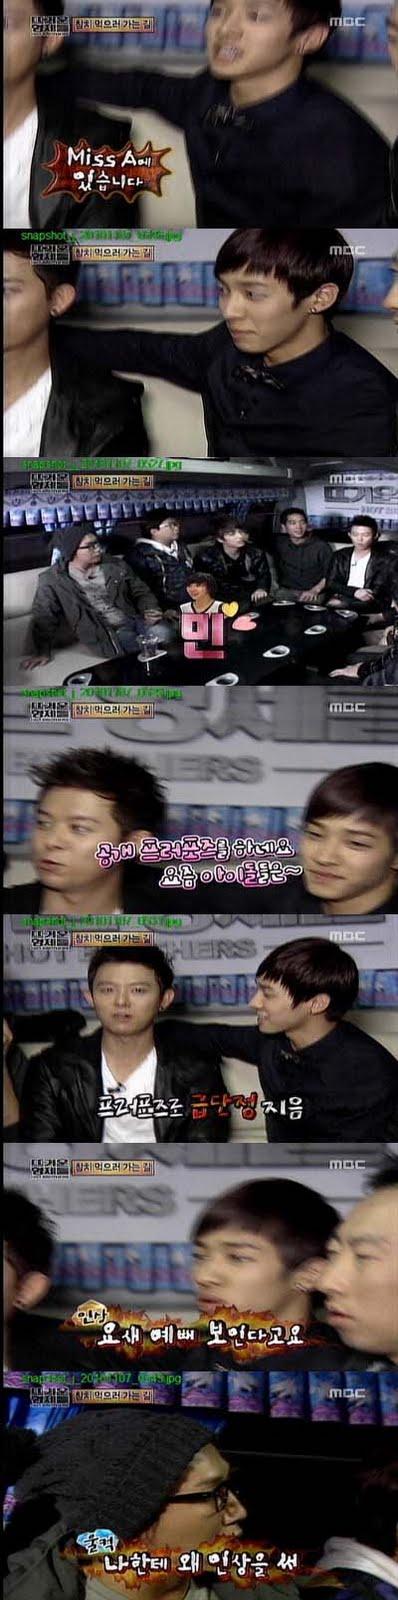 Beast lee kikwang dating 8